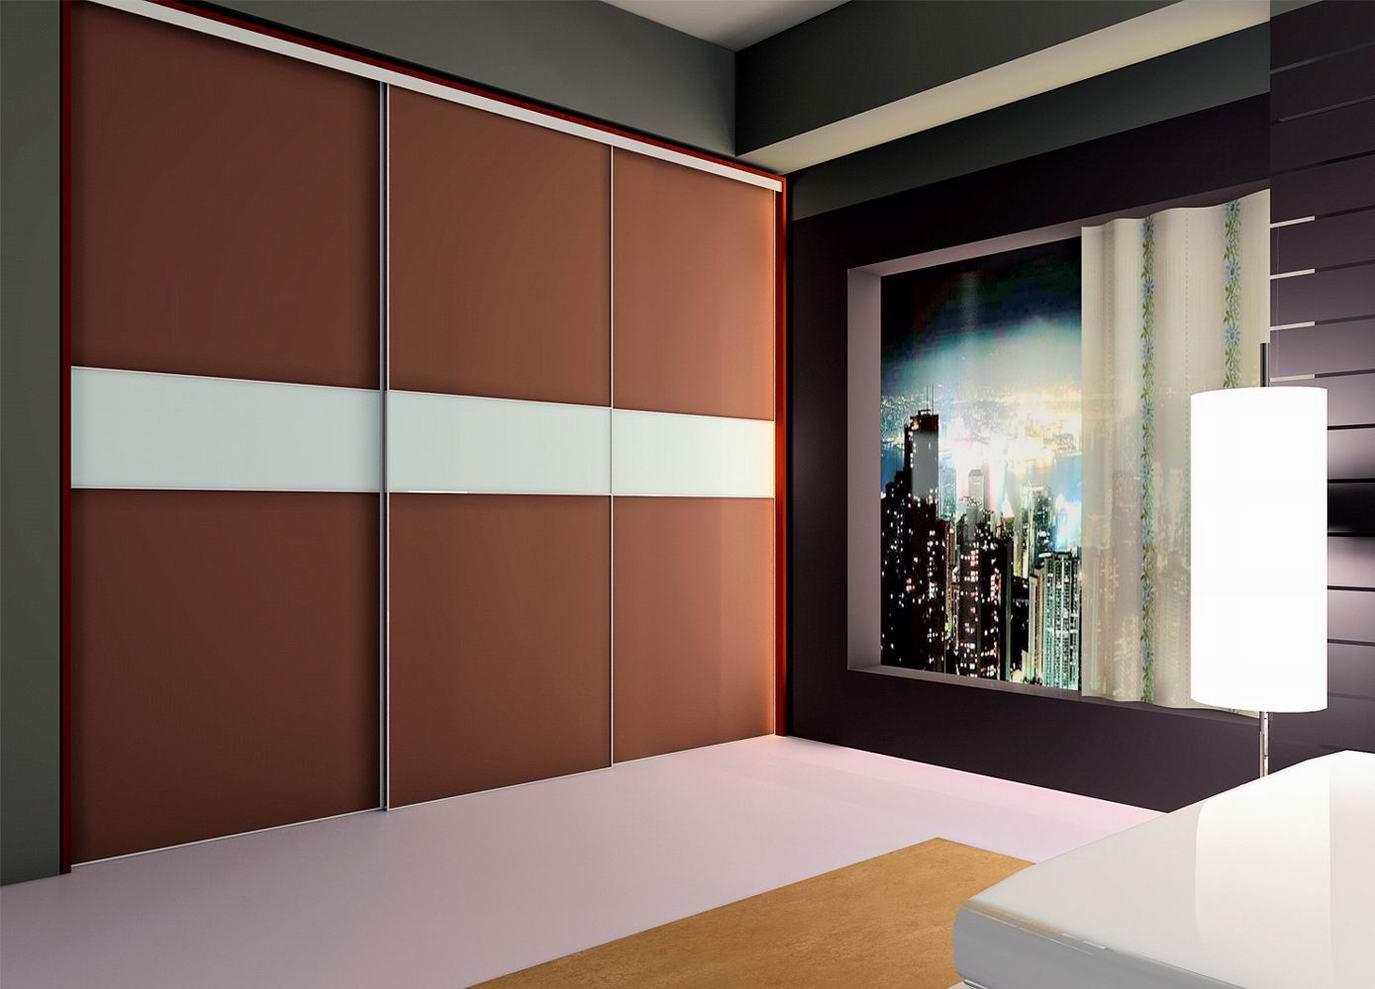 Дизайн шкафа-купе (127 фото): идеи фасадов в прихожую или ко.